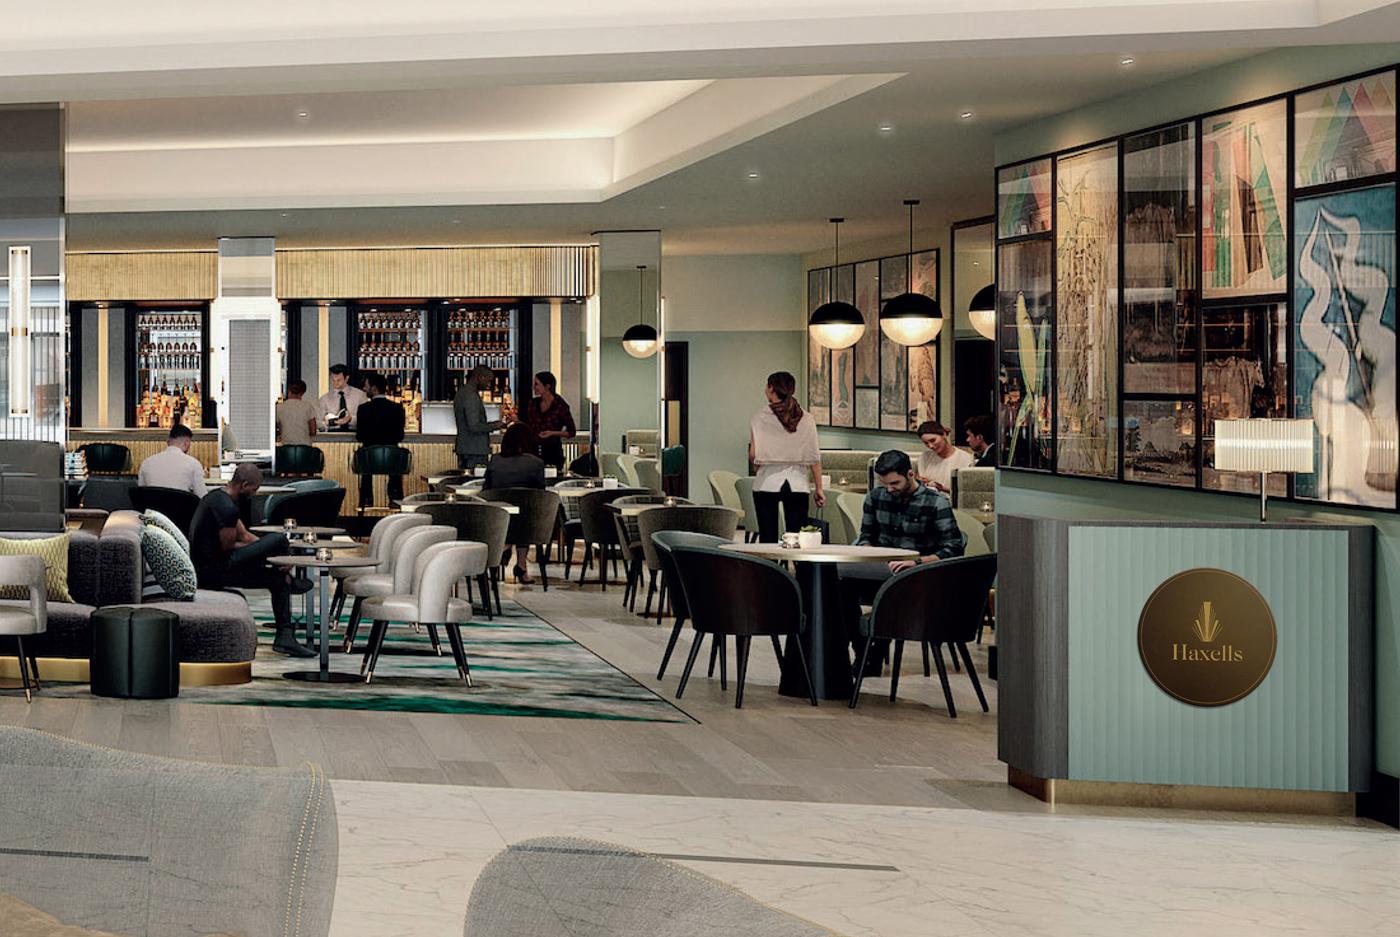 strand palace hotel brand storytelling Haxells restaurant